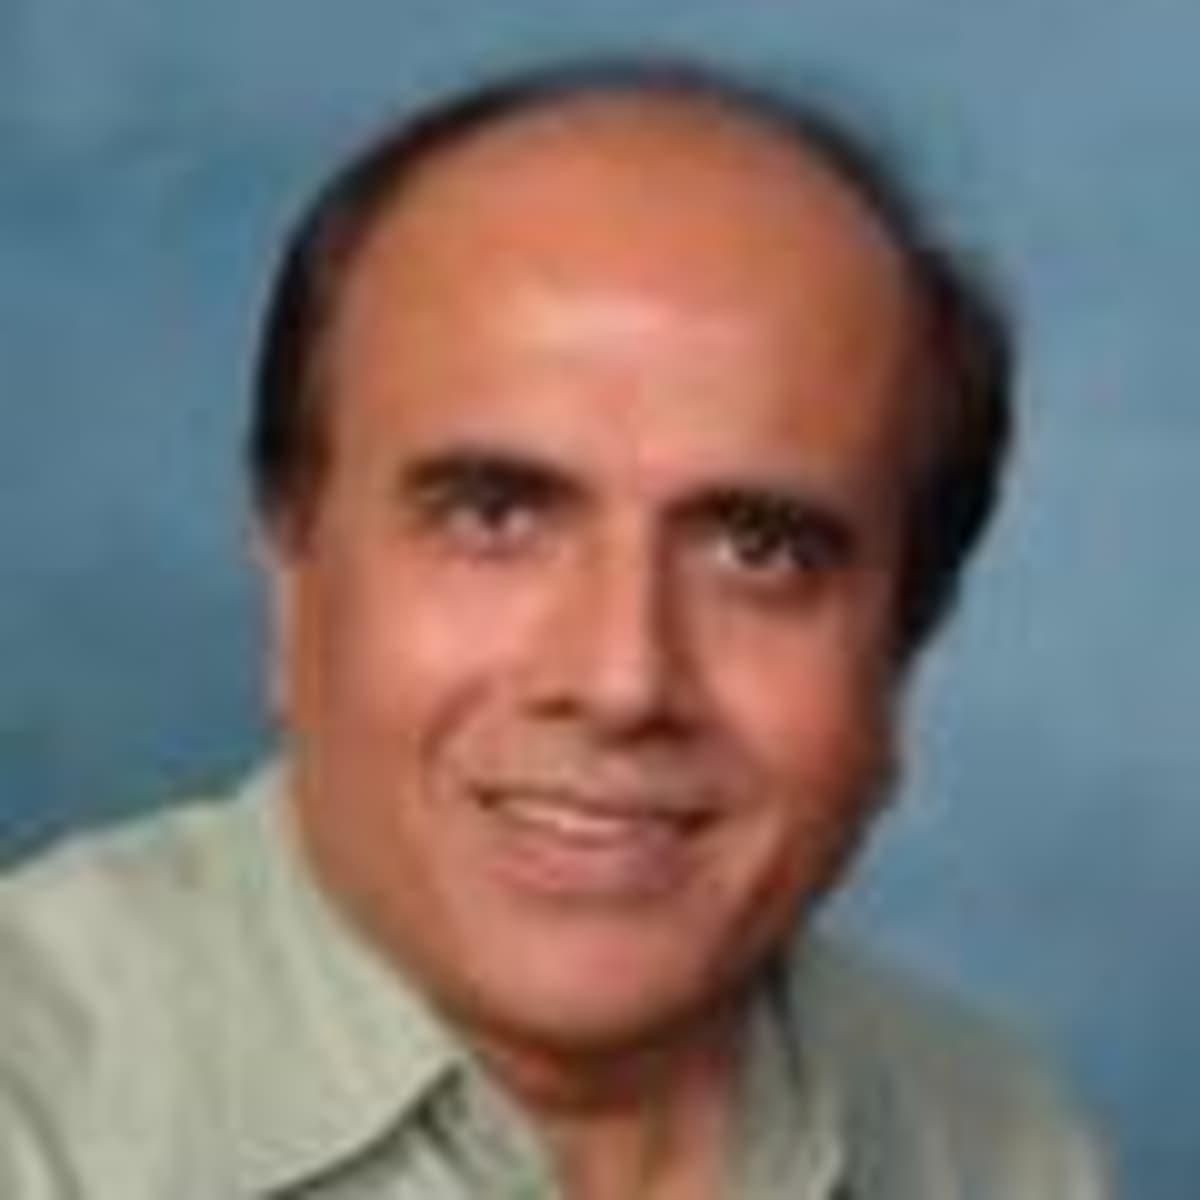 Life and education akshay ramanlal desai